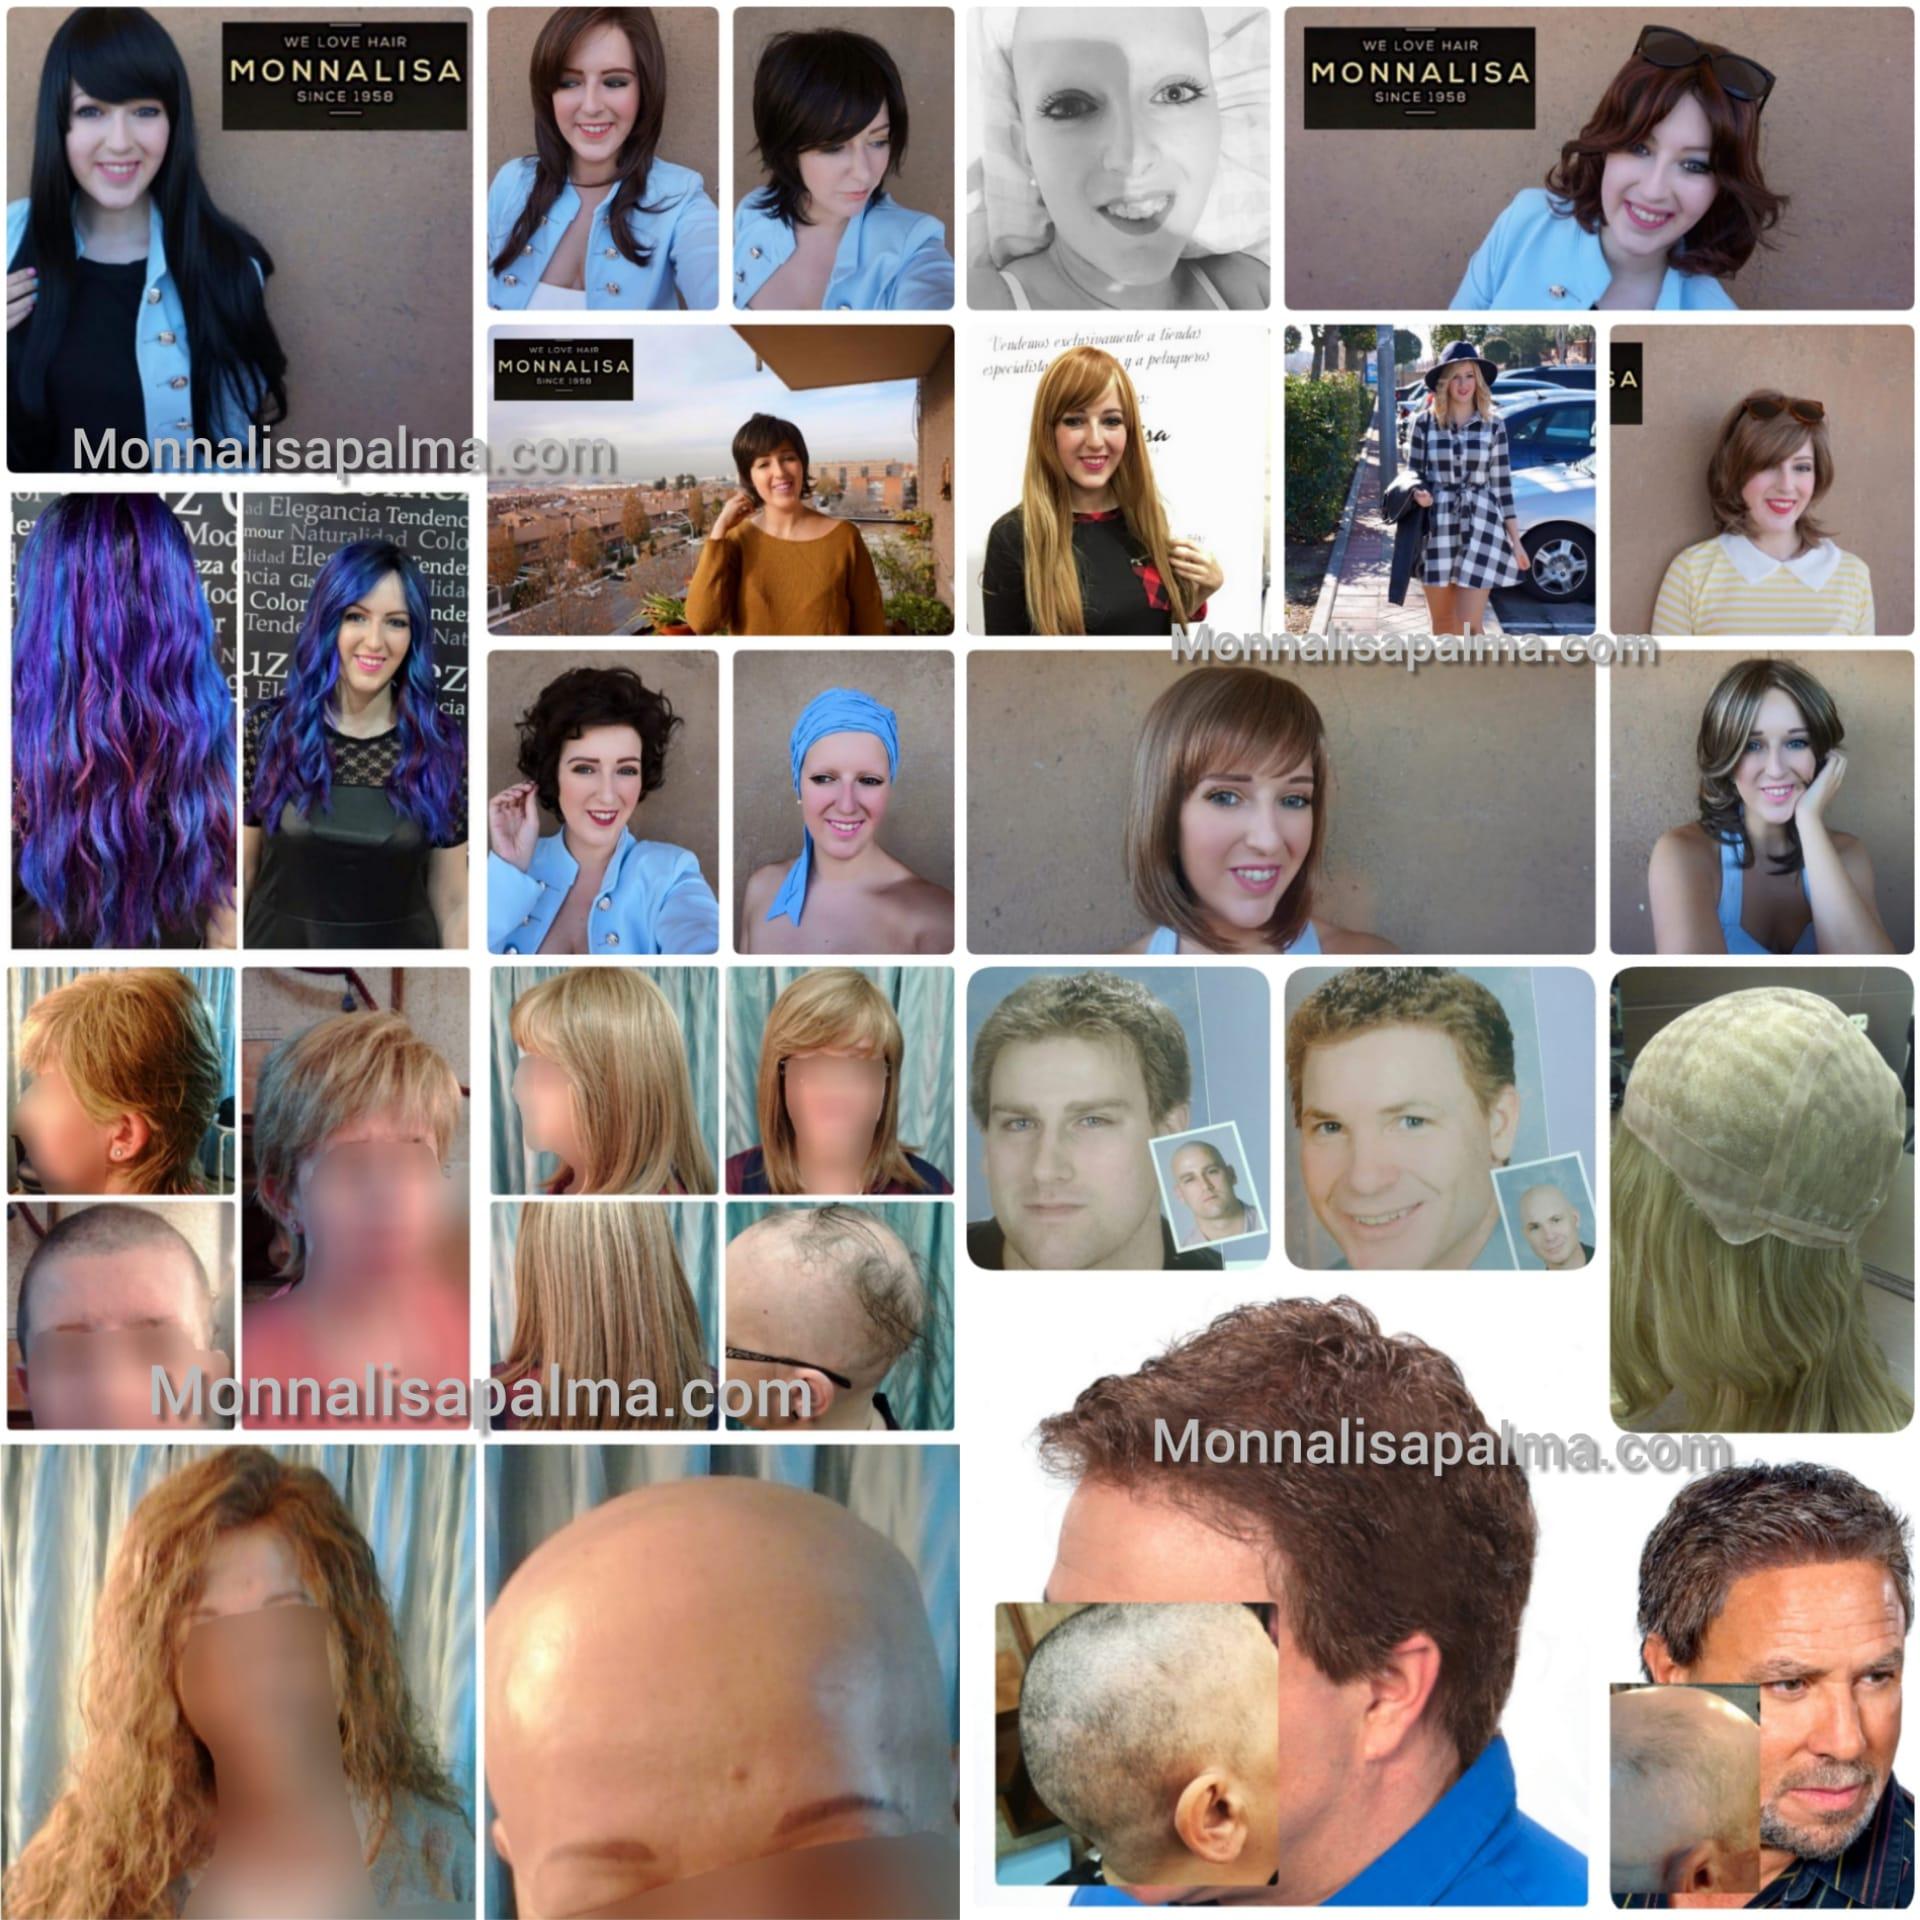 foto-alopecia-monna-lisa-palma-1